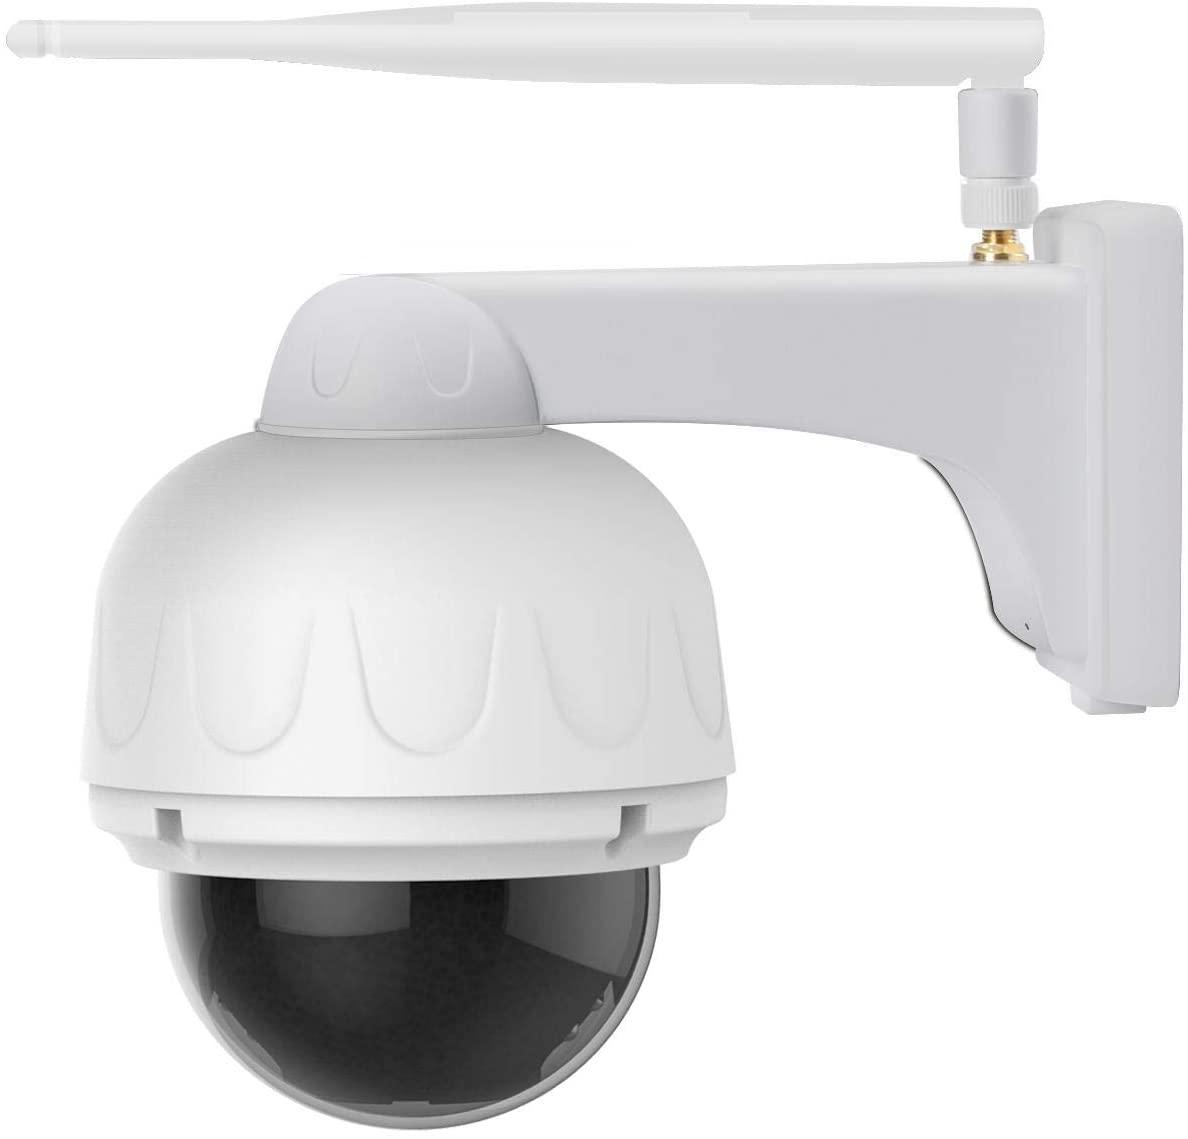 Redcolourful Vstarcam C32S-X4 1080P IP Camera 4X Zoom IP66 Waterproof Outdoor WiFi Camera Auto Focus PTZ CCTV Surveillance Security Camera IR Night UK Plug